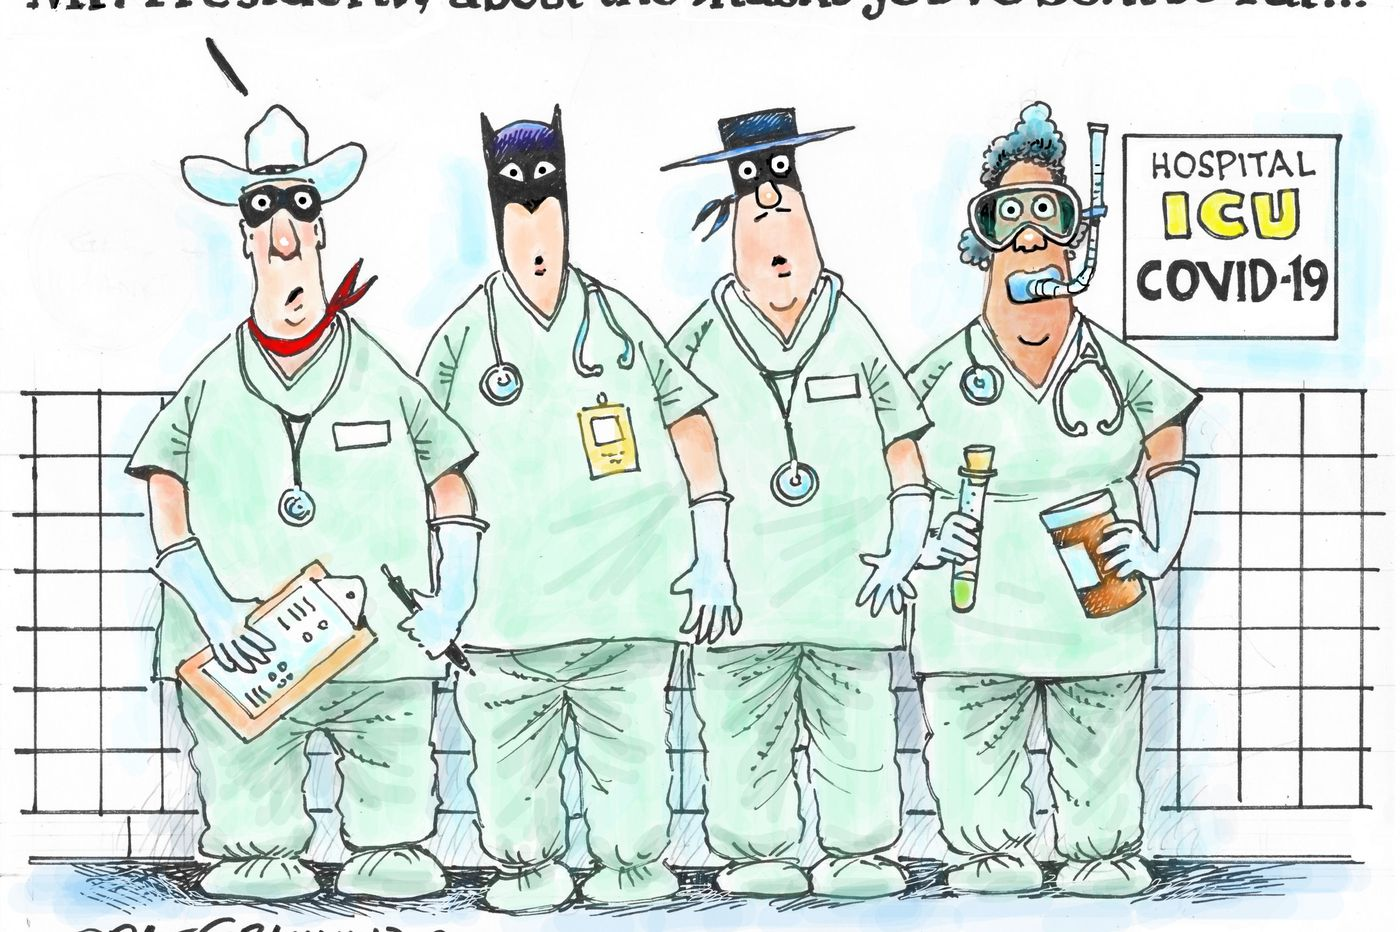 Coronavirus cartoons: 10 artists show how America is adjusting | Opinion